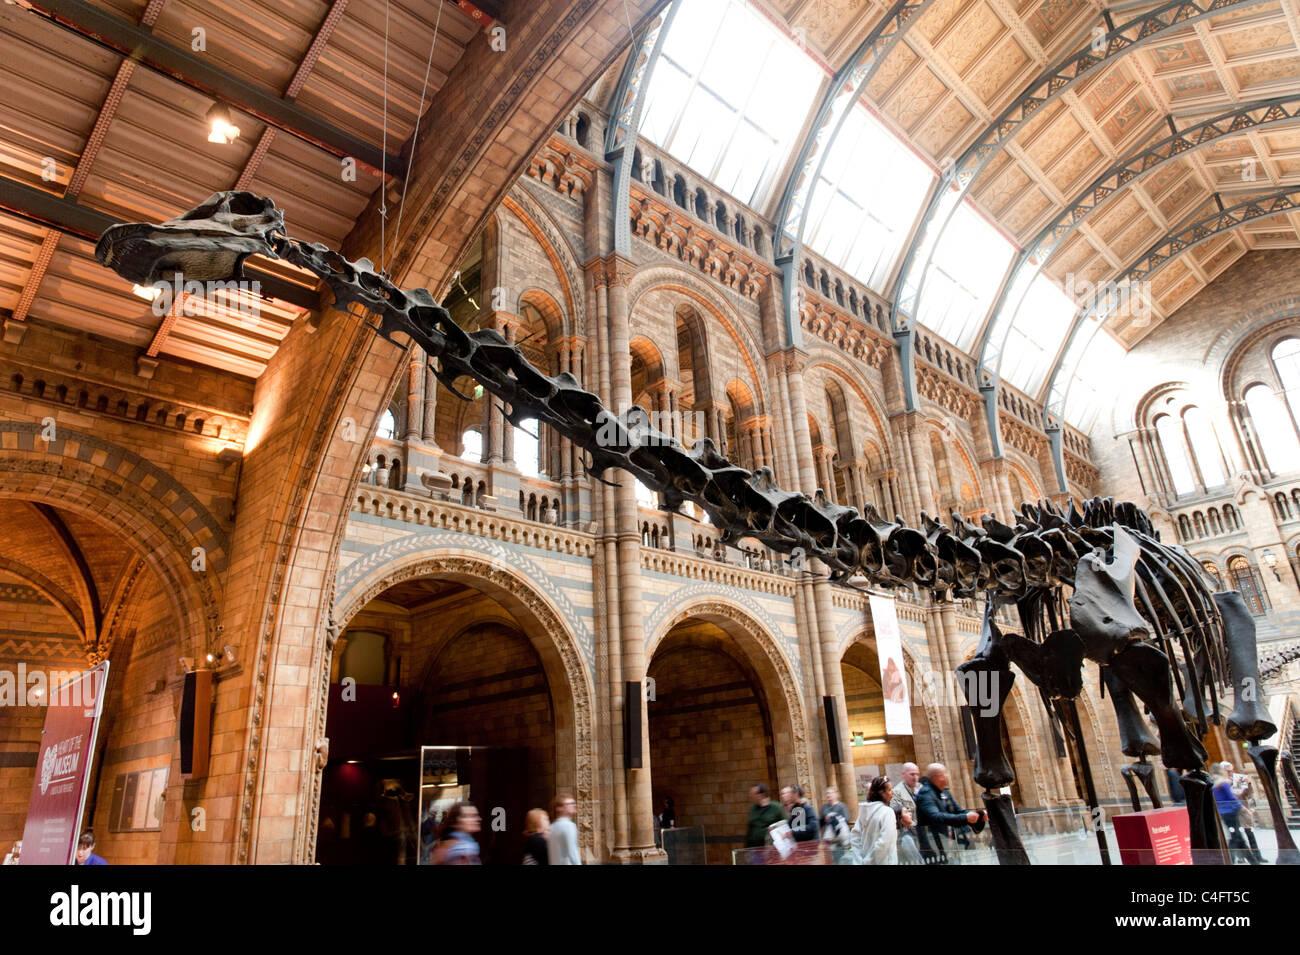 Diplodocus dinosaur at the Natural History Museum, London, UK - Stock Image